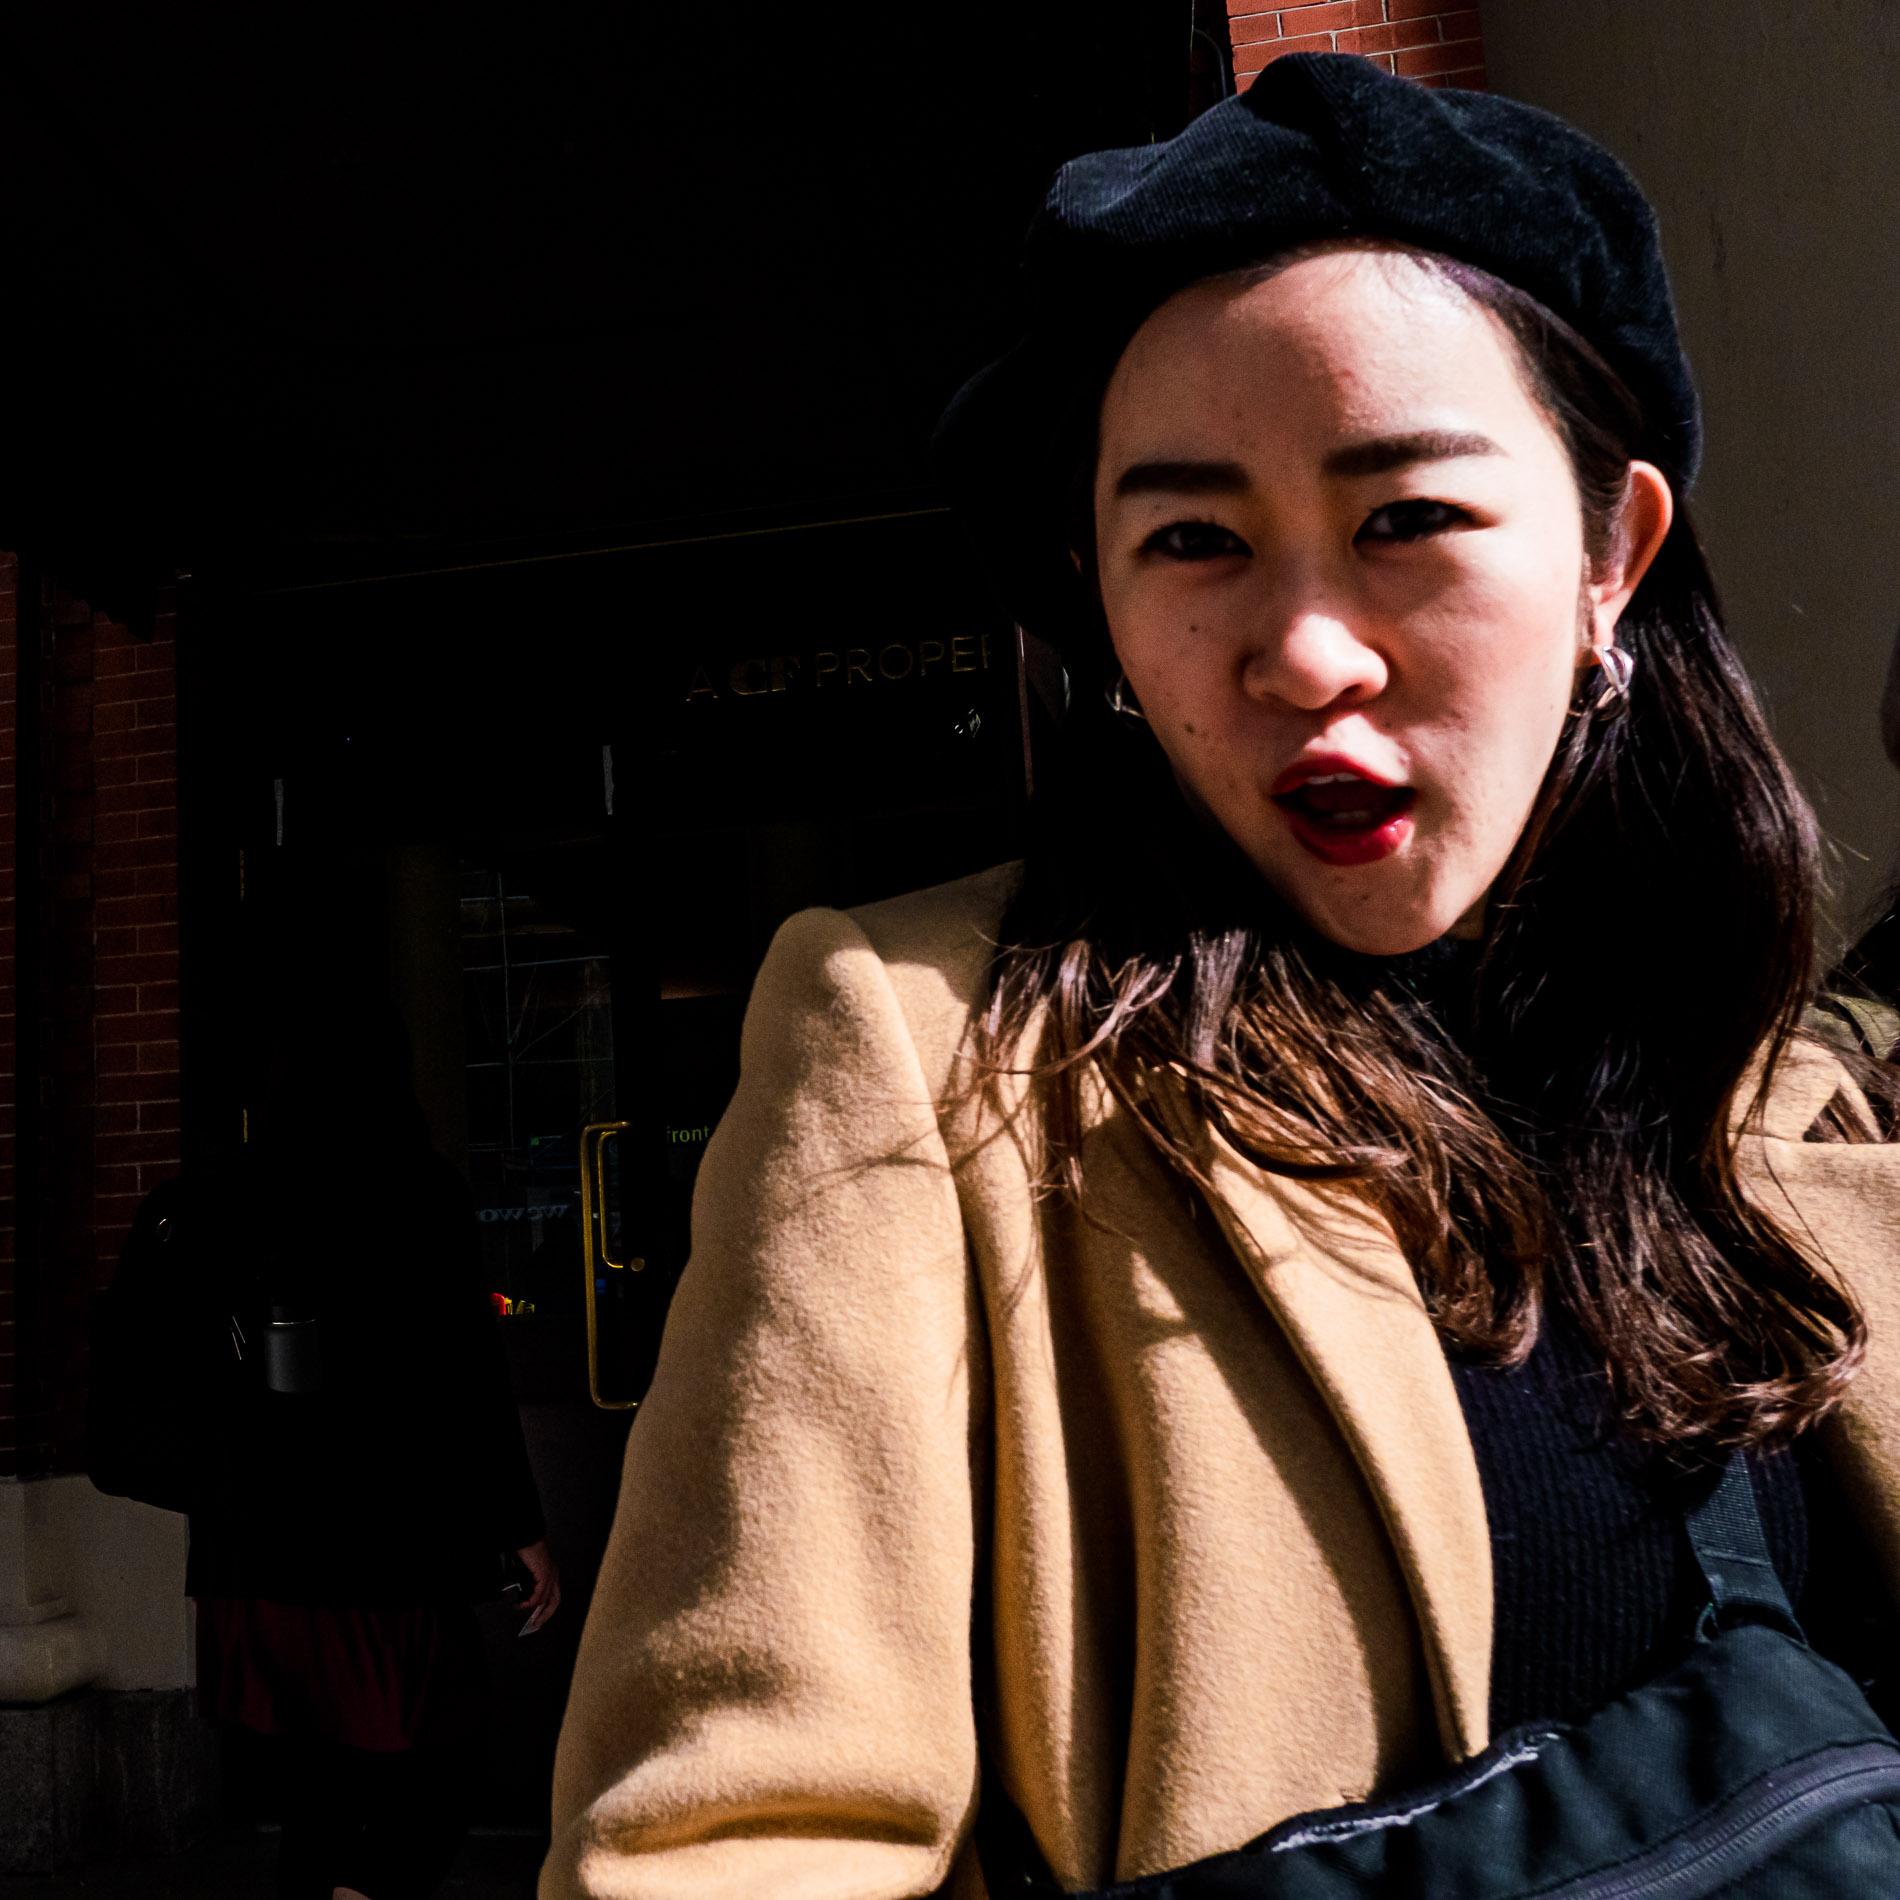 Junge Frau in Osaka sehr erfreut